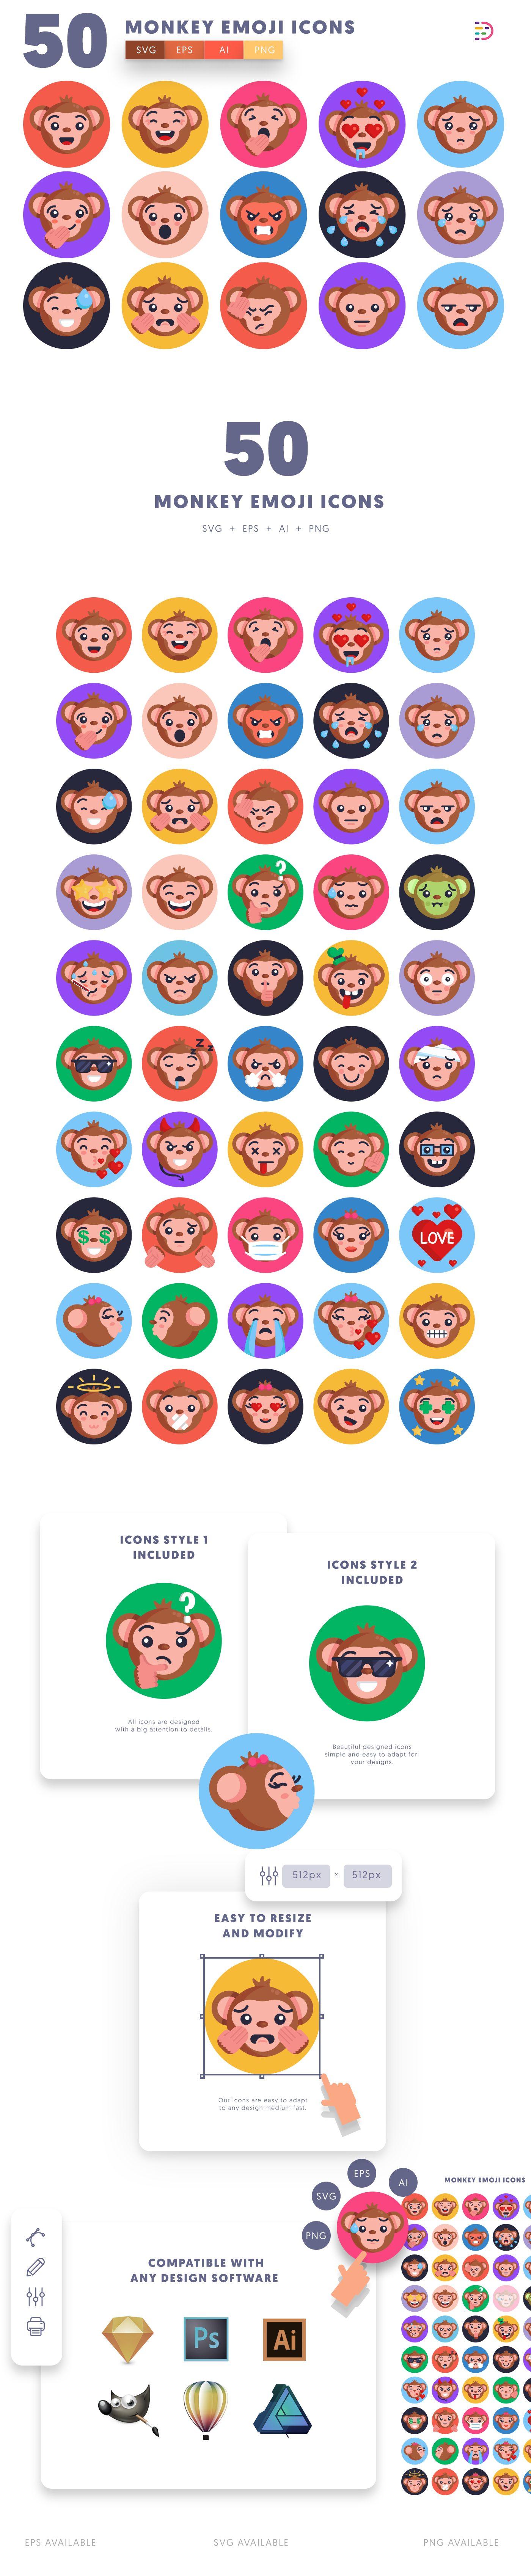 Monkey Emoji icons info graphic